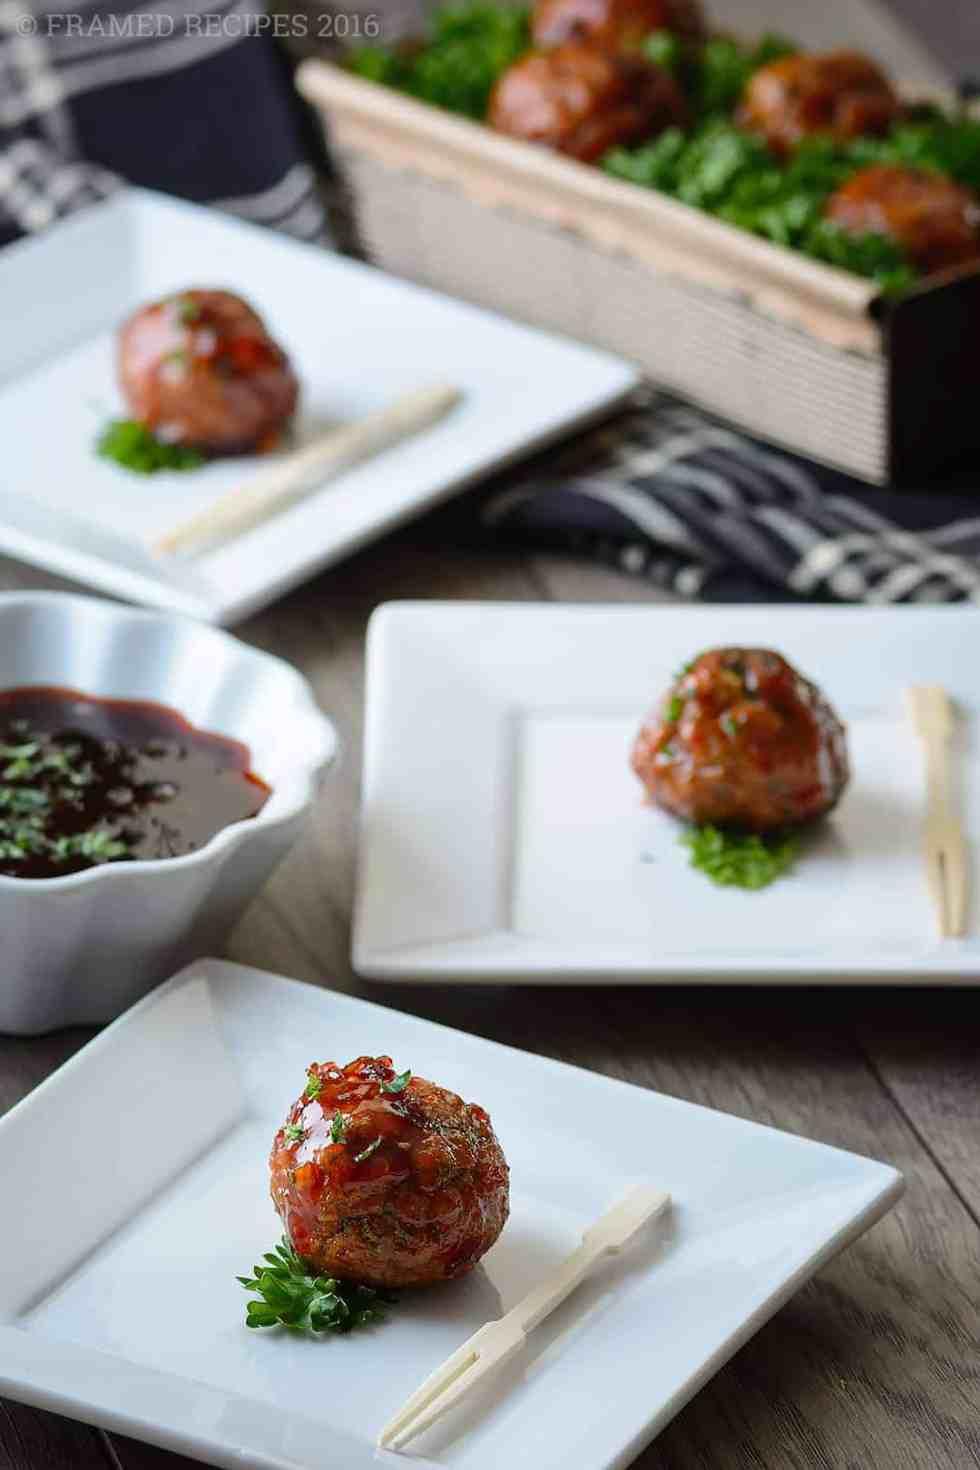 Baked Turkey Meatballs with Spicy Brown Sugar Glaze